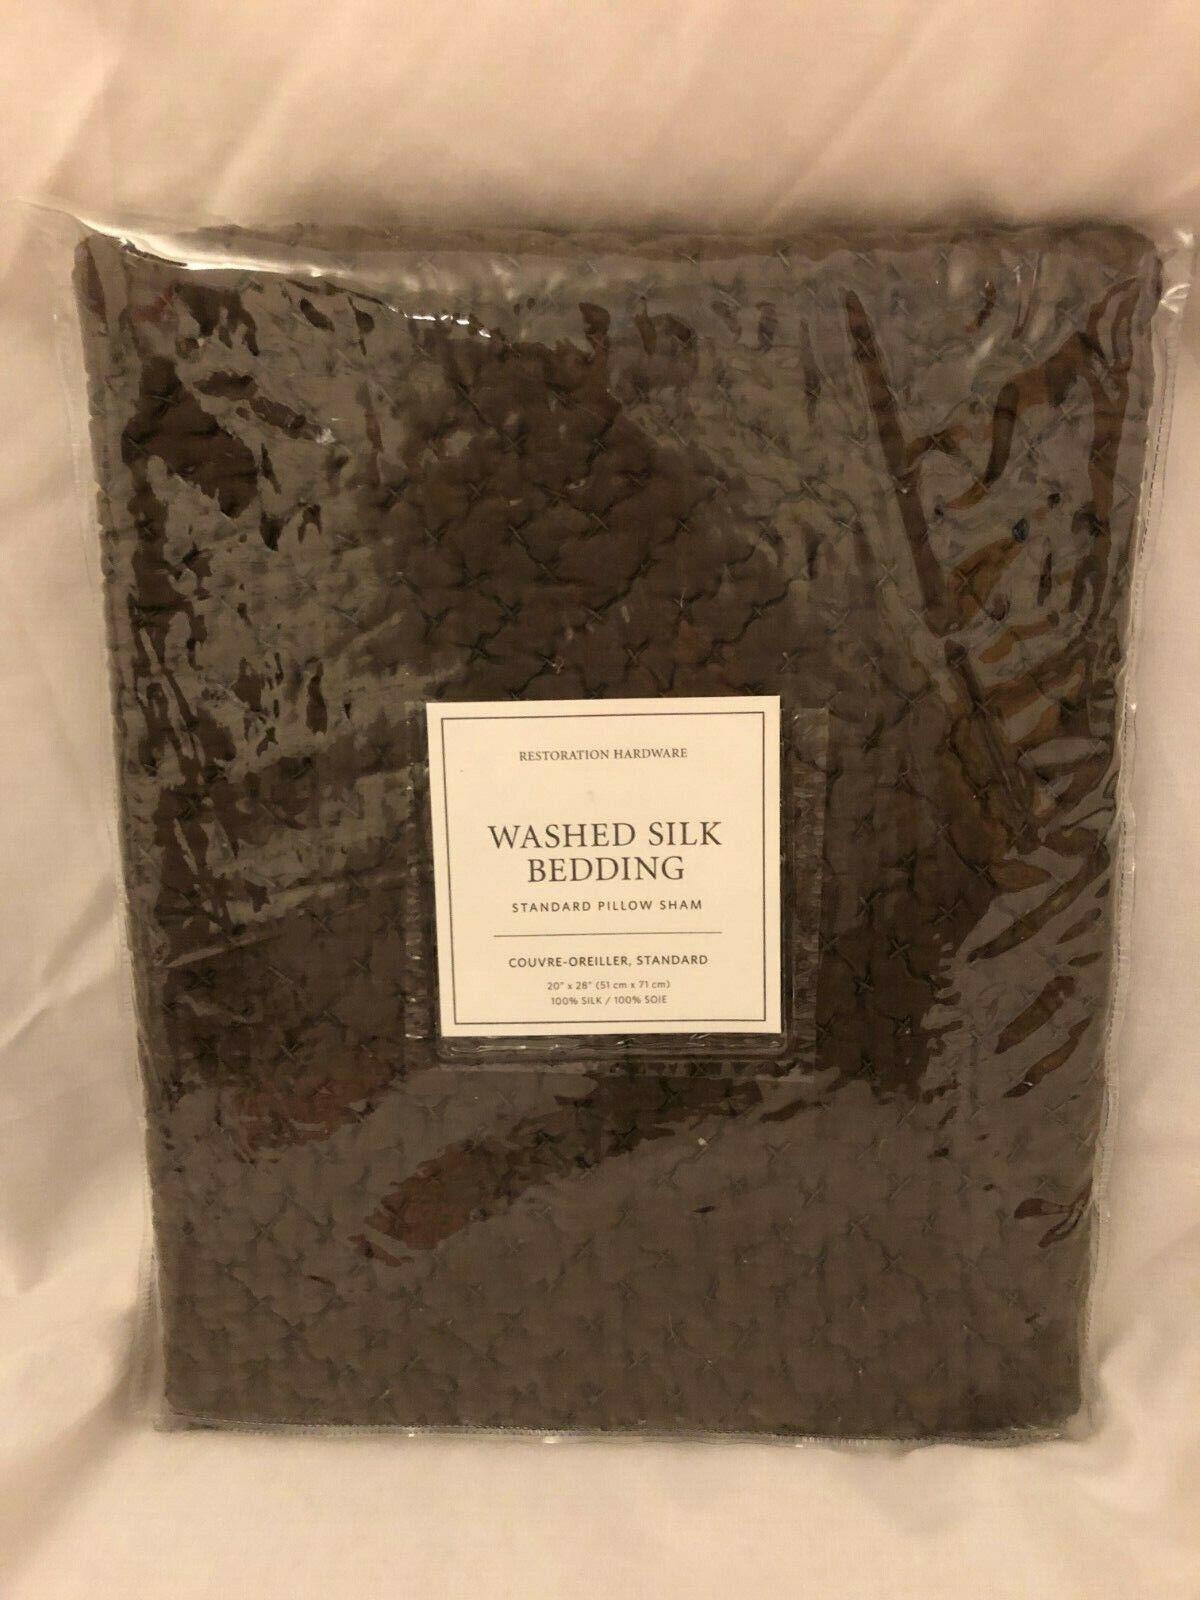 Restoration Hardware Brown Standard Pillow Sham Washed Silk Sable New